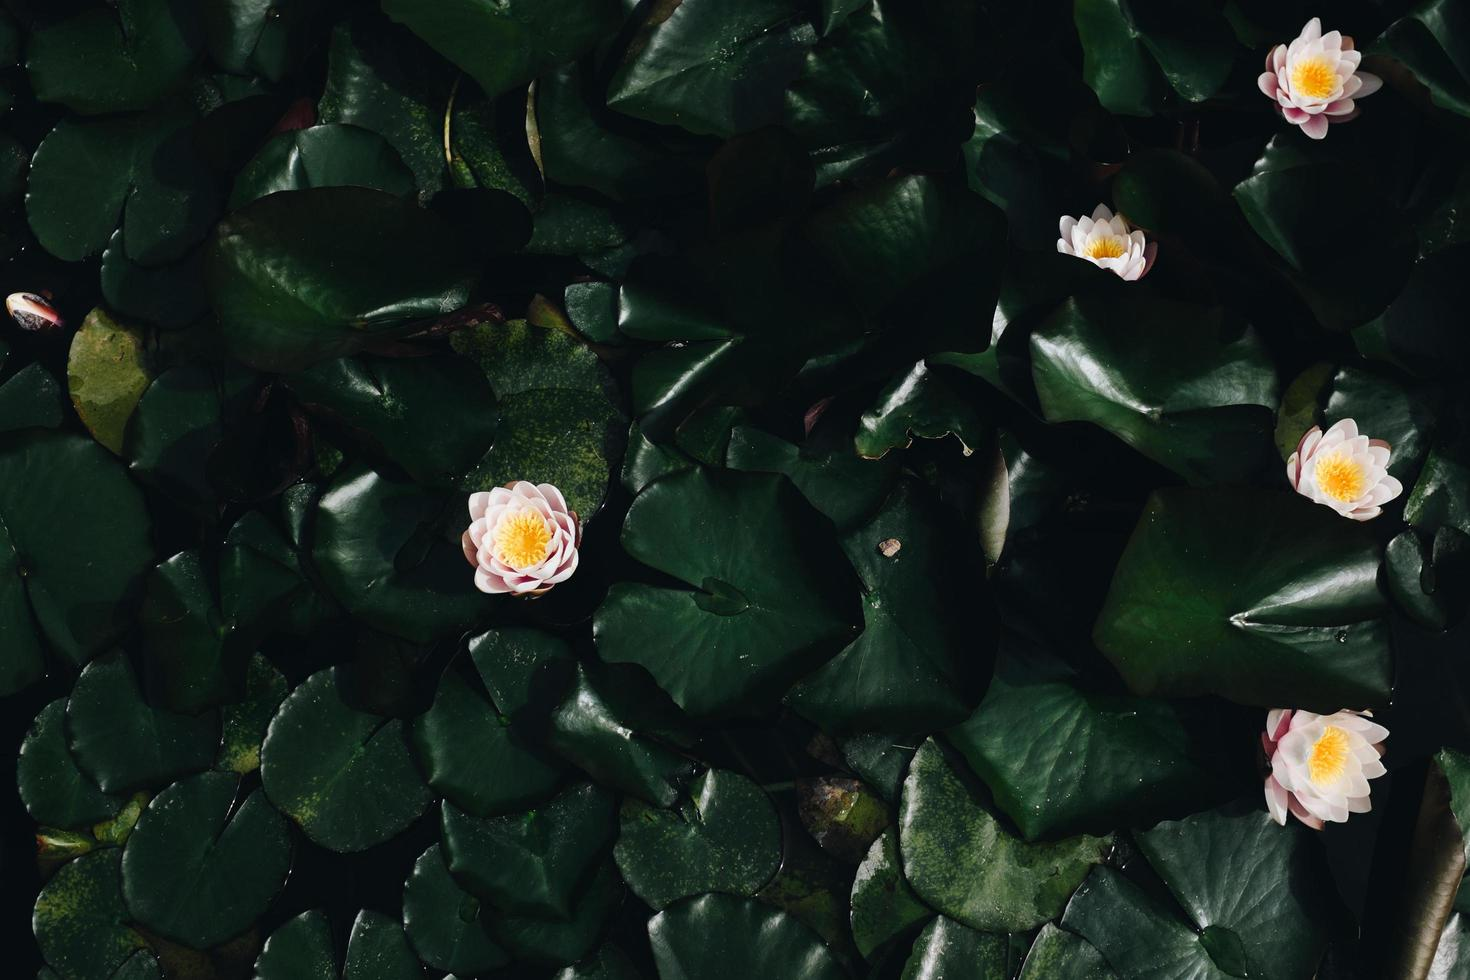 flor de lótus branca foto